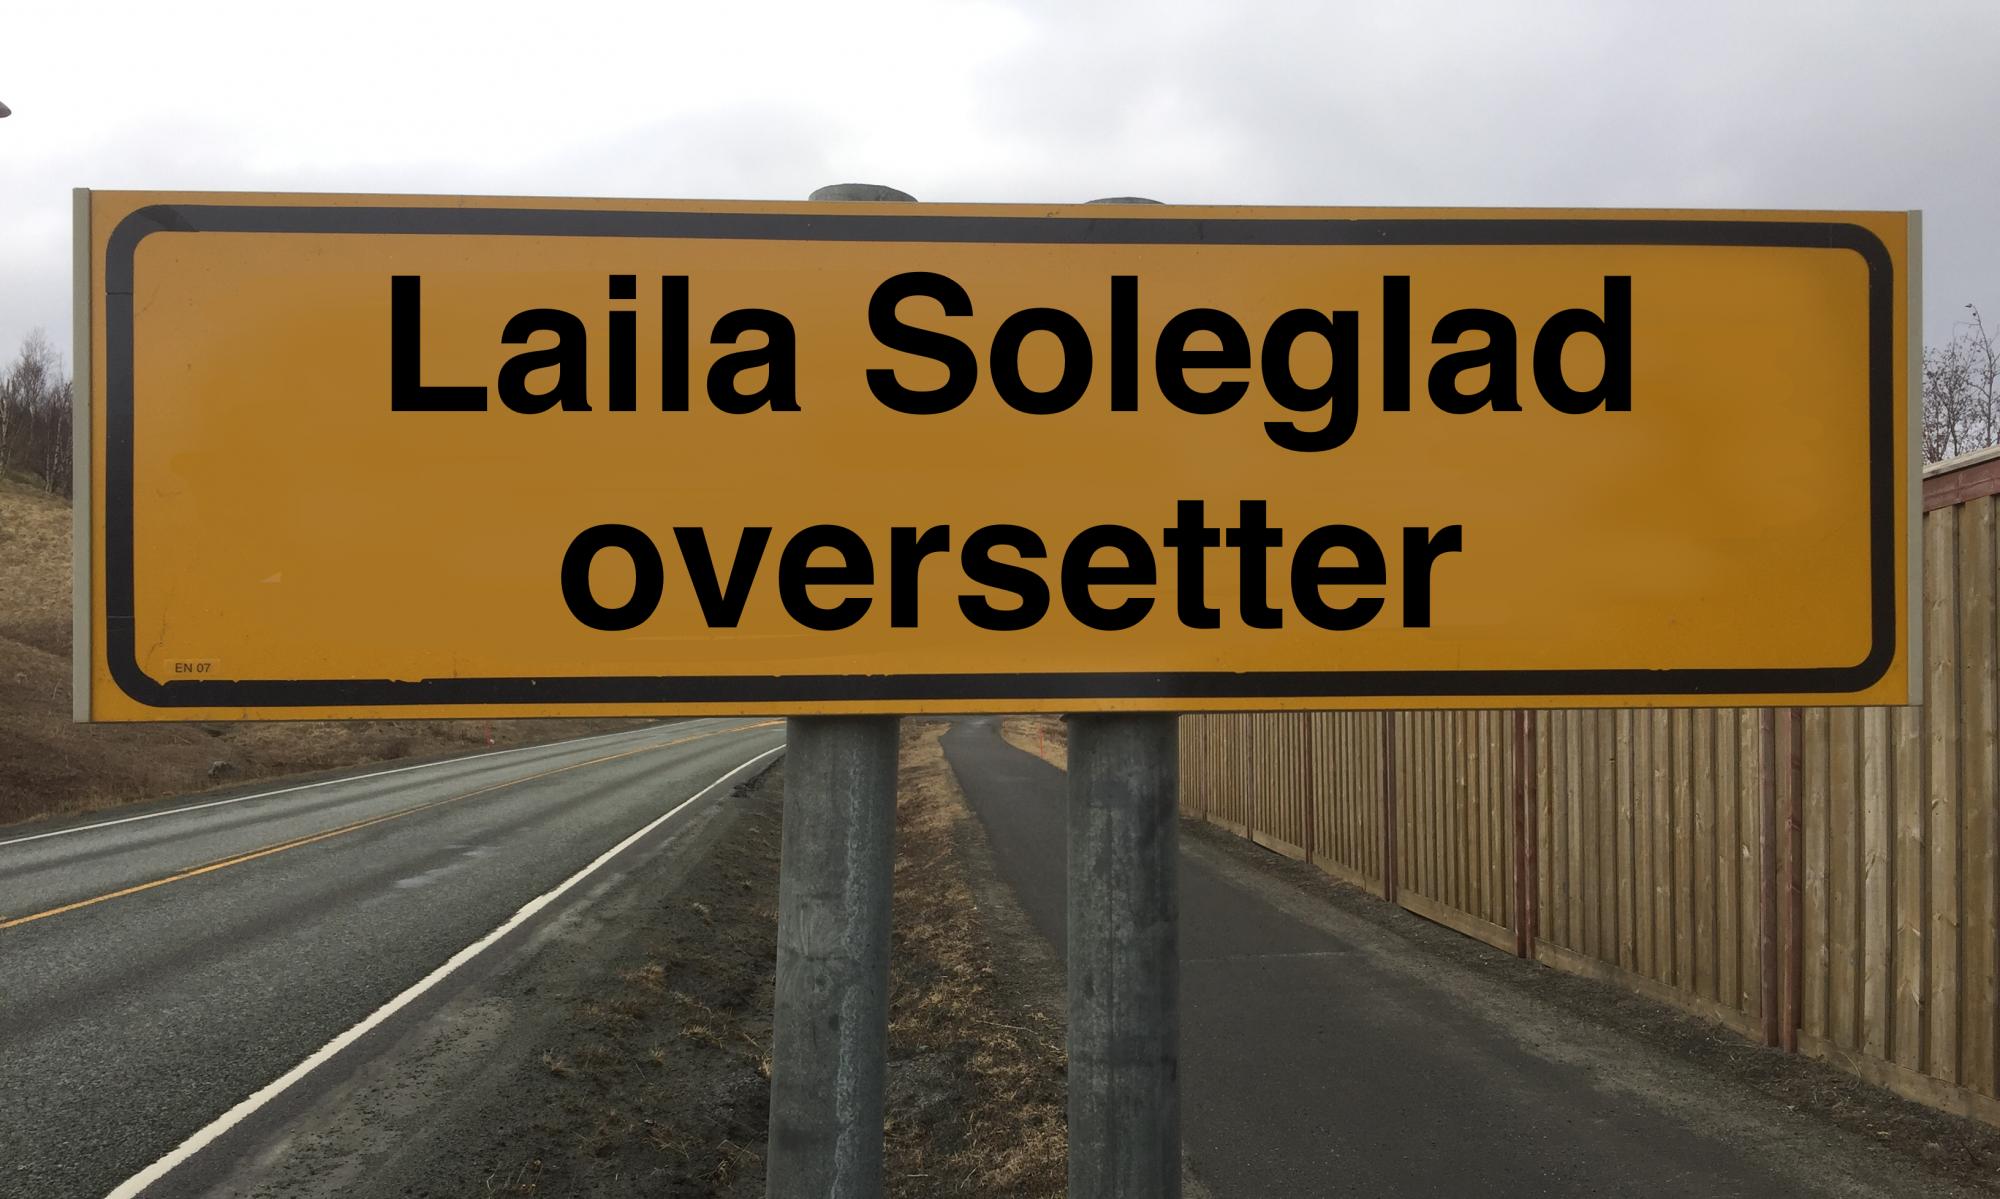 Laila Soleglad oversetter